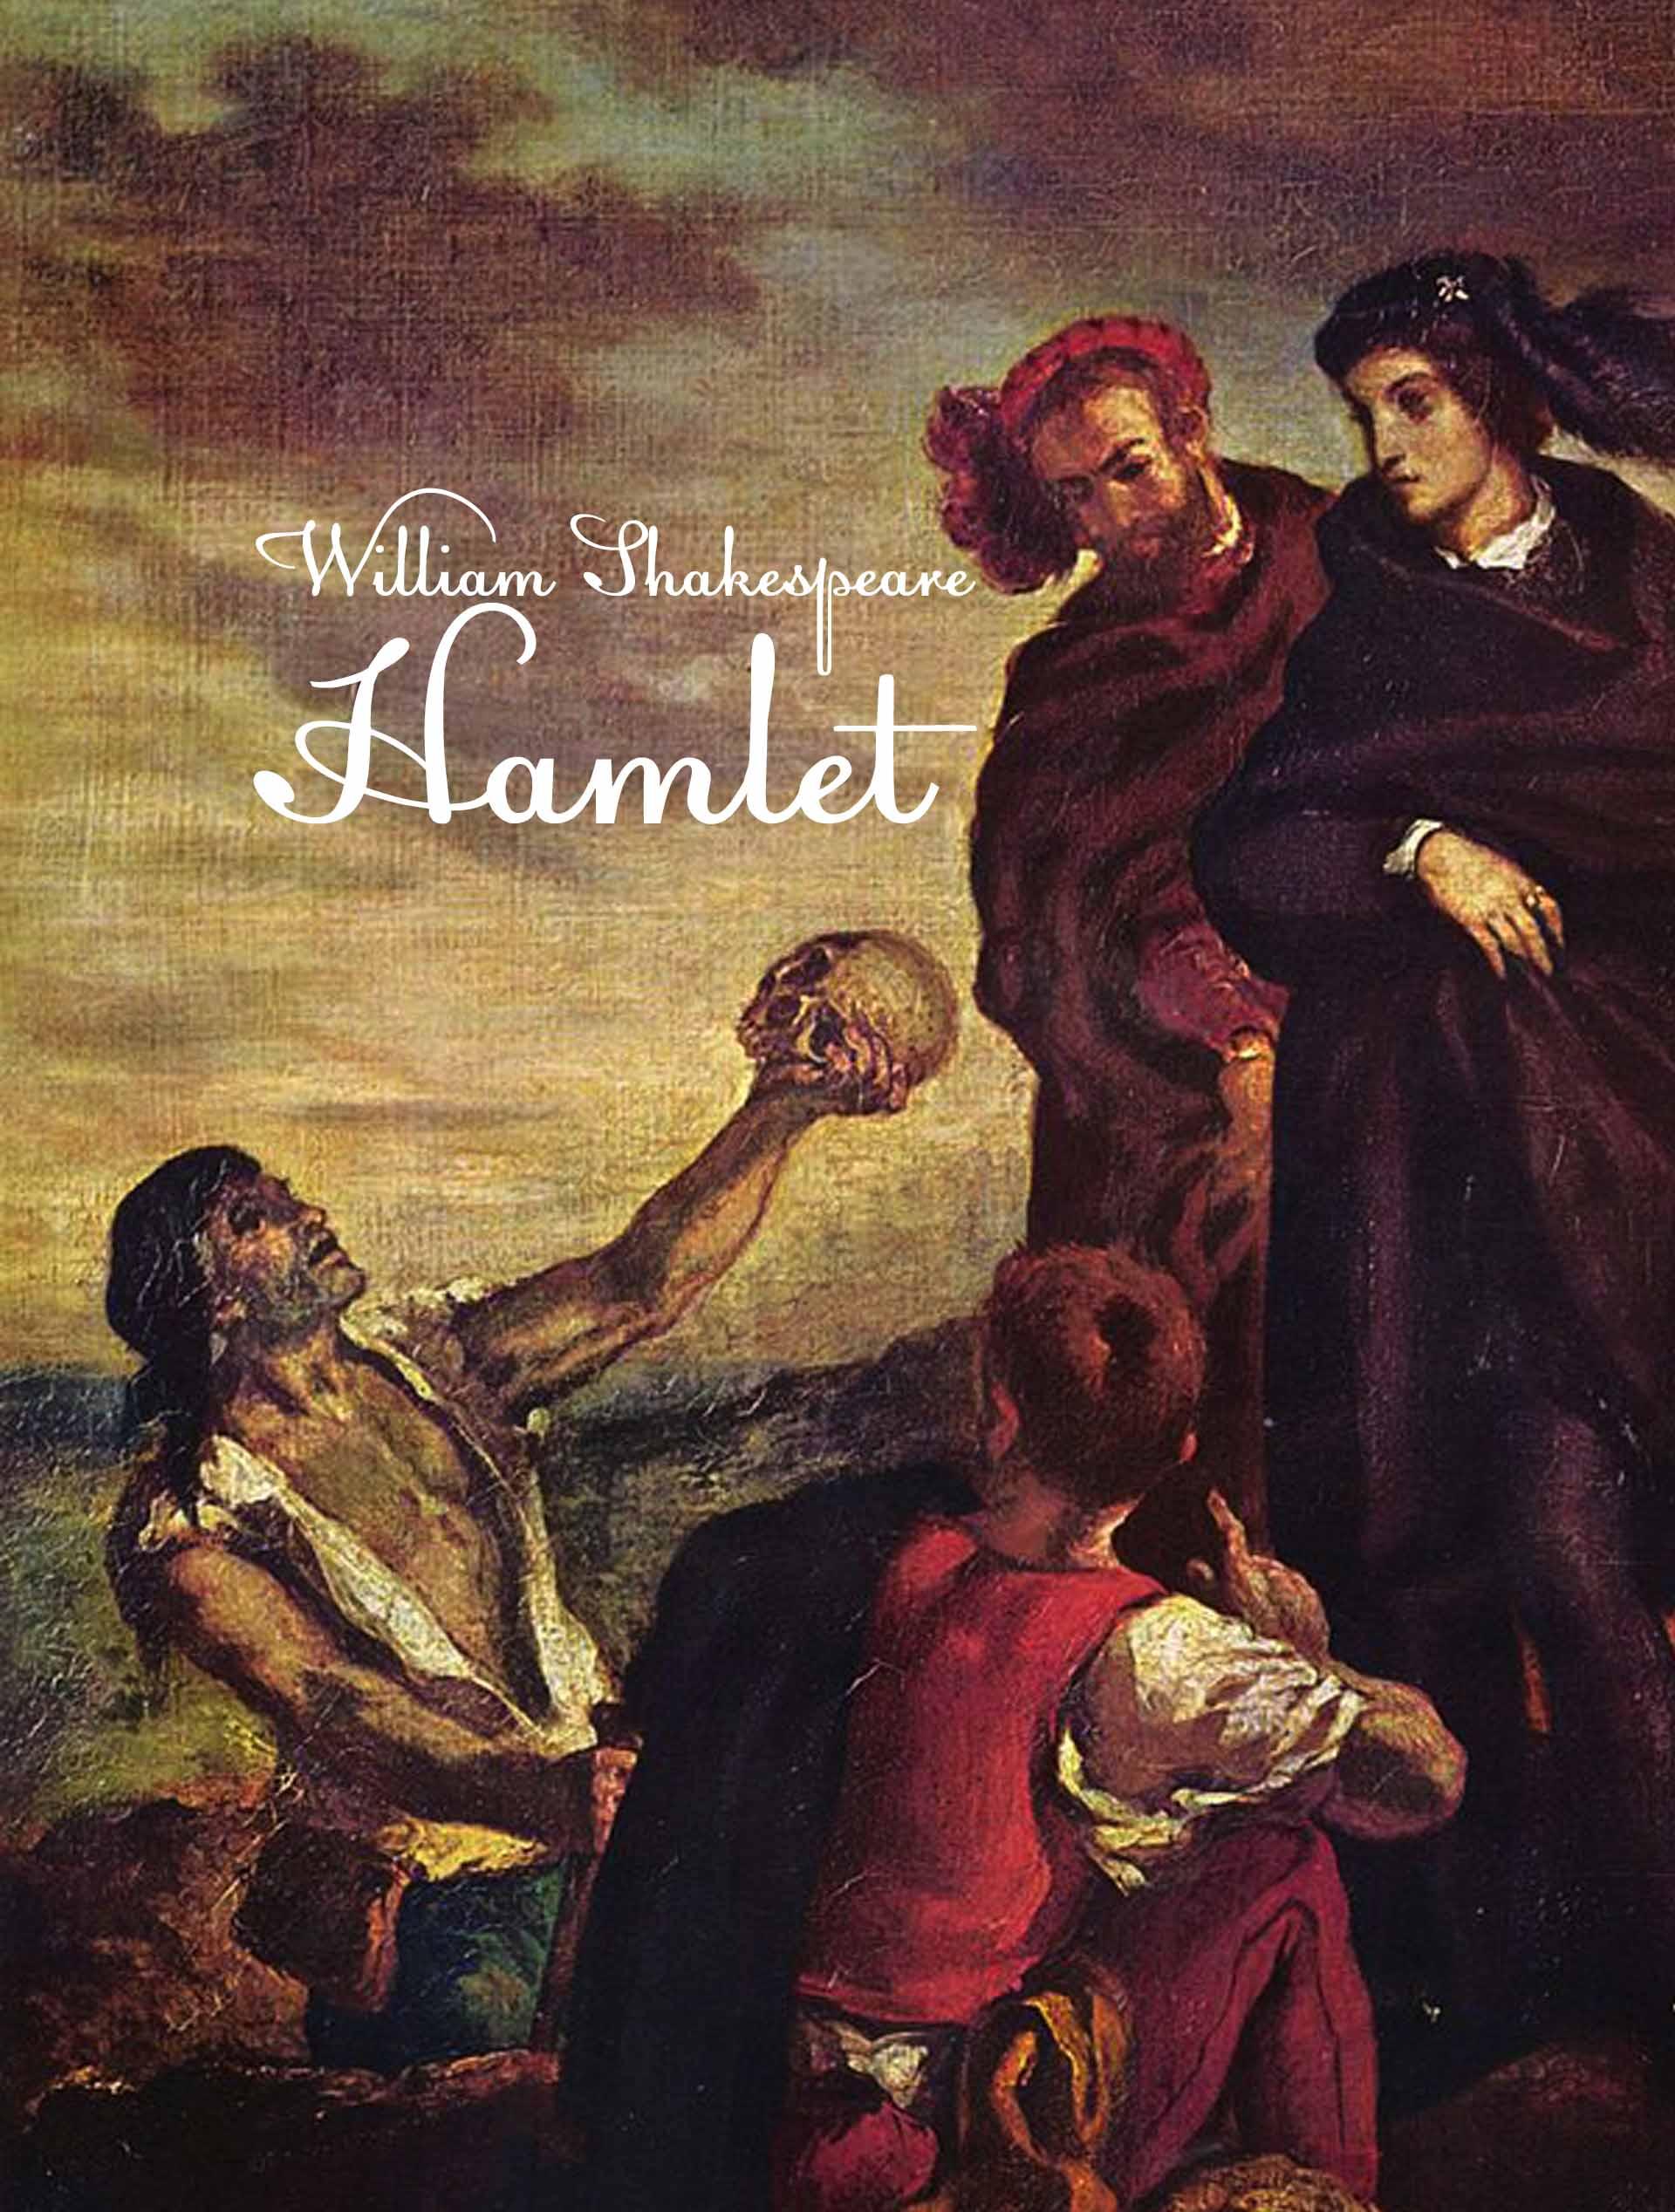 Revenge in the play hamlet by william shakespeare